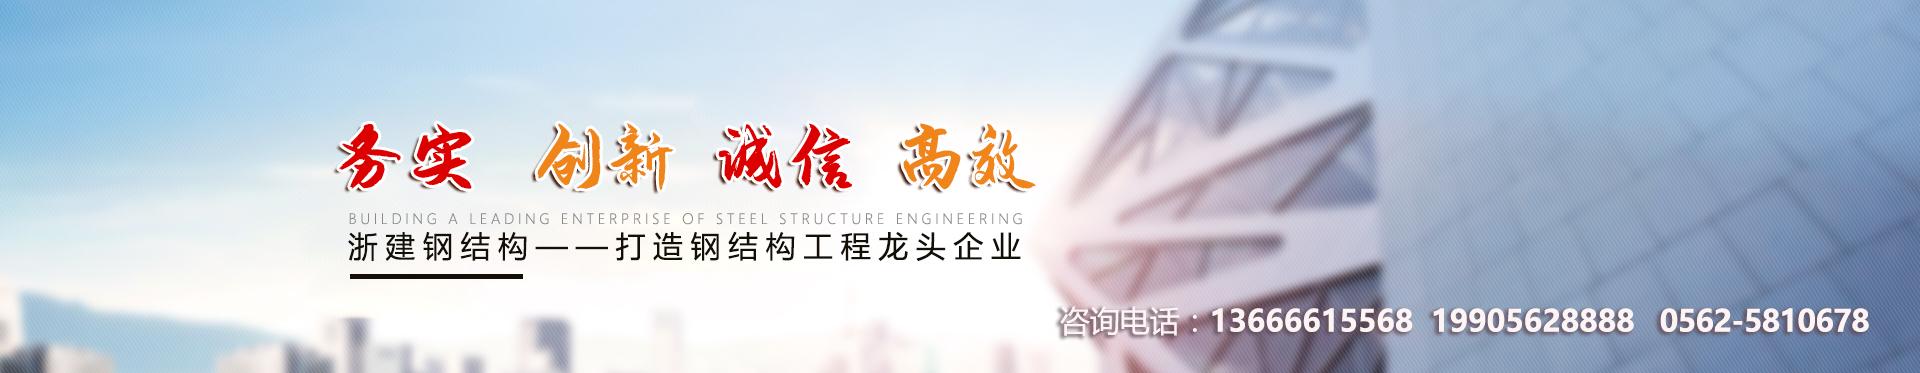 http://www.ahzhejian.com/data/upload/202101/20210109150249_832.jpg